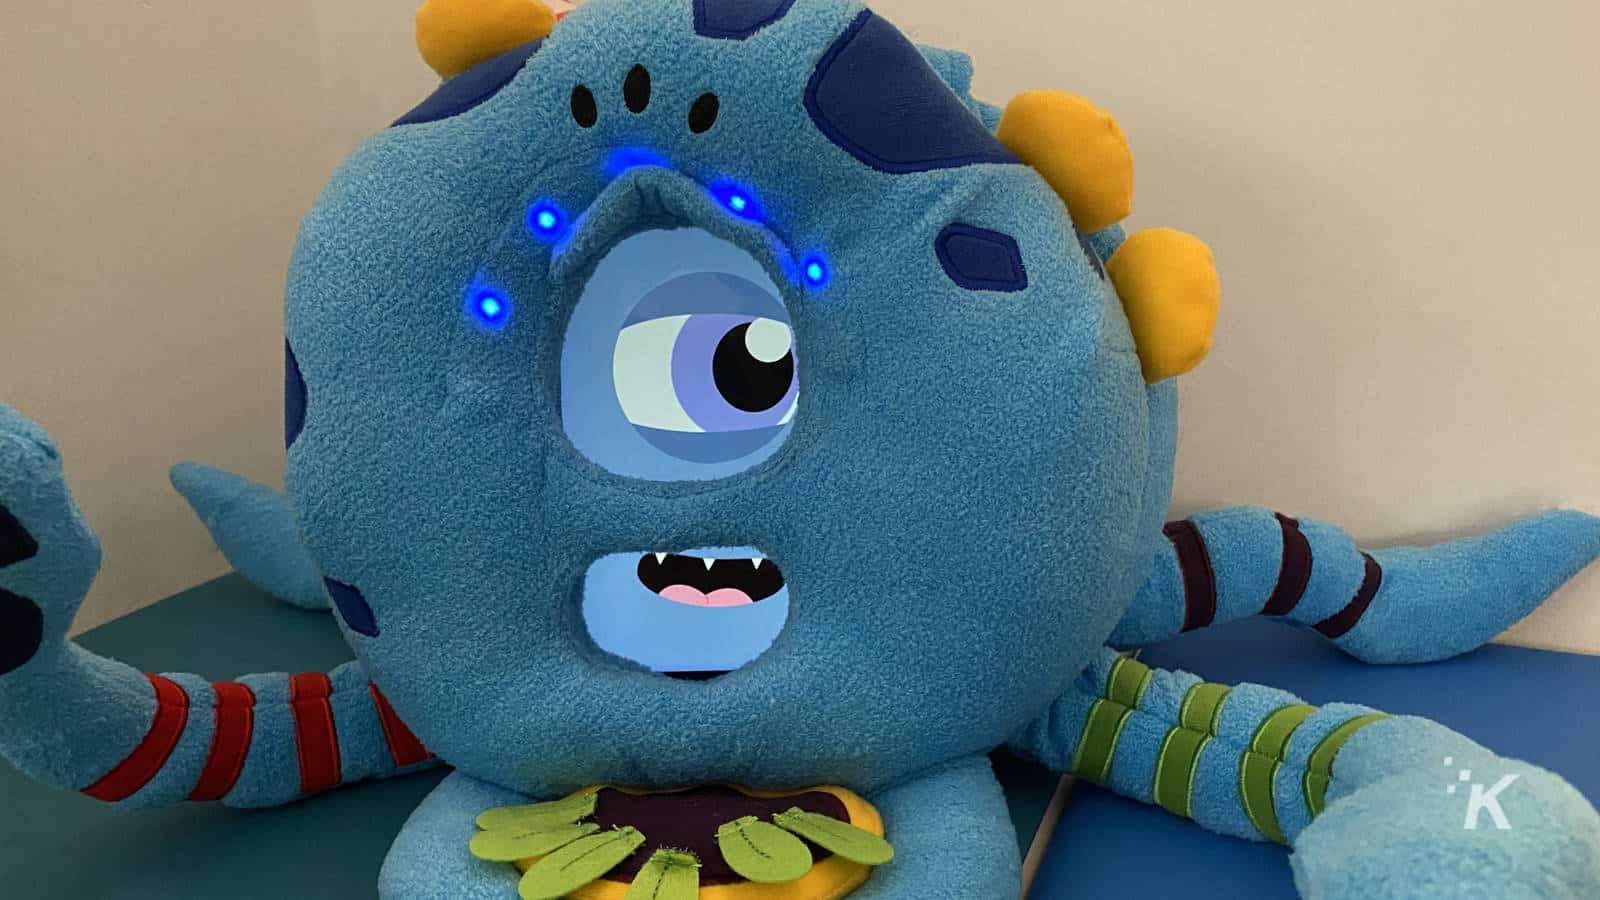 octobo smart learning system